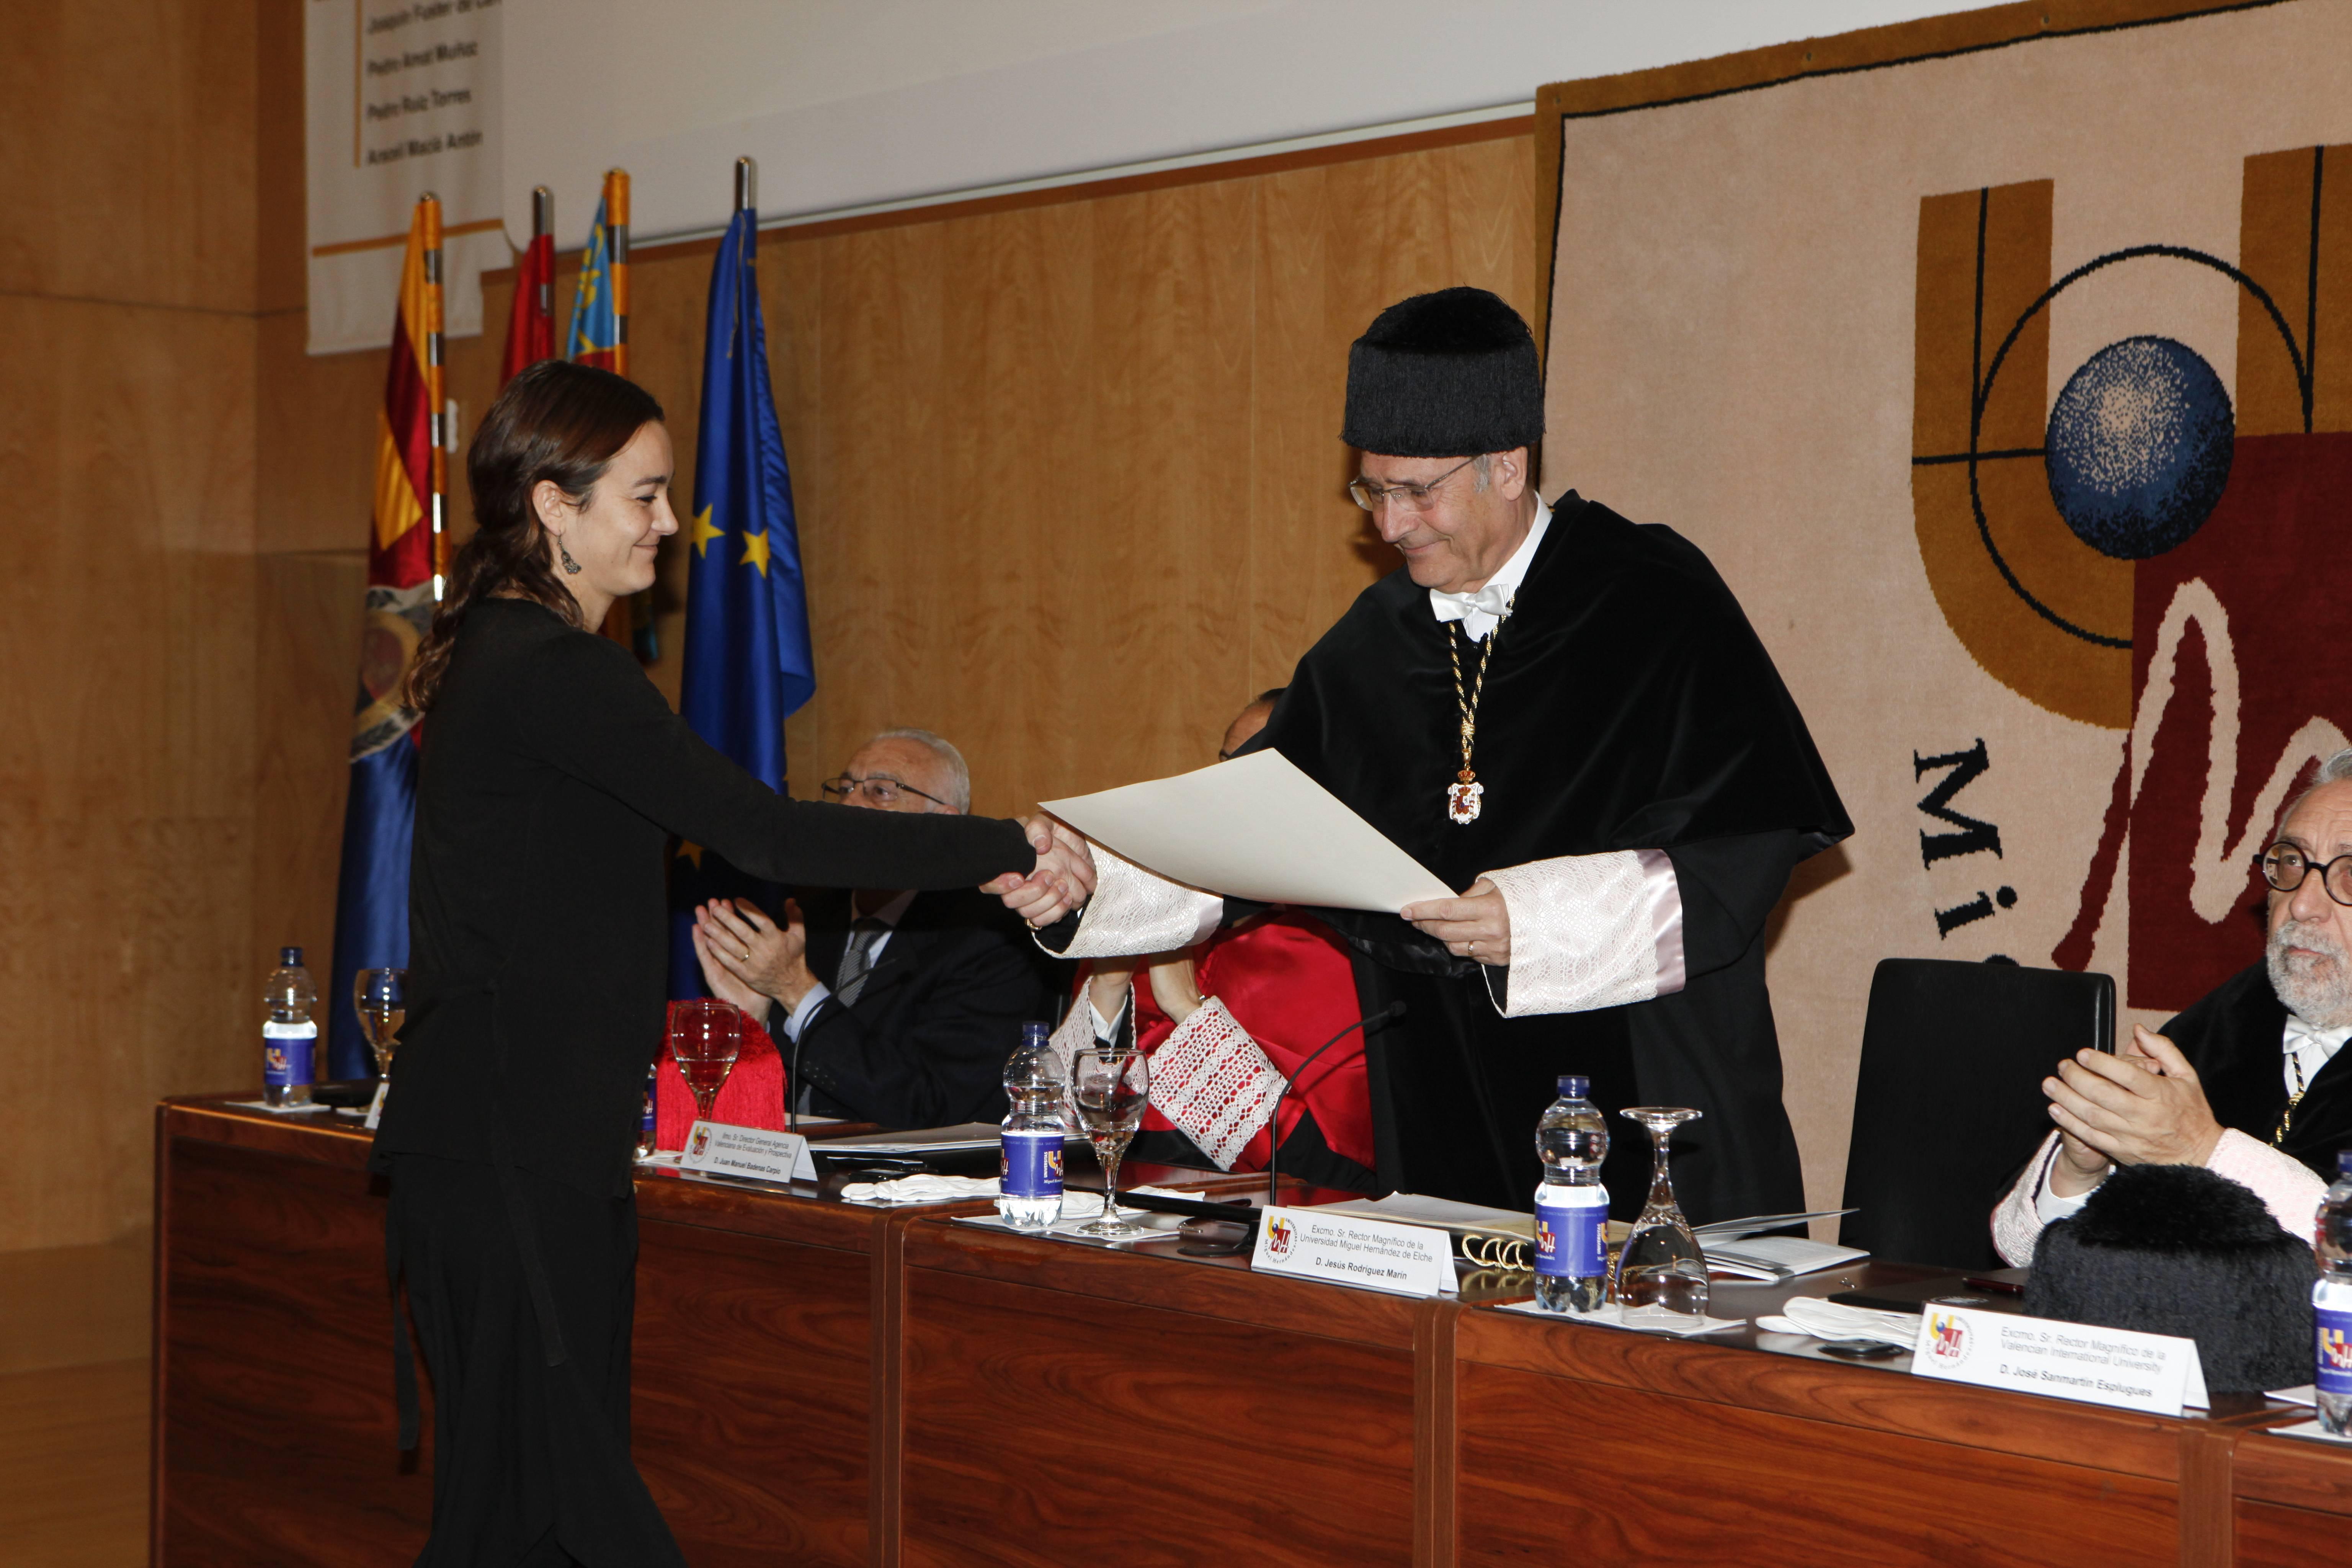 doctor-honoris-causa-luis-gamir_mg_1049.jpg